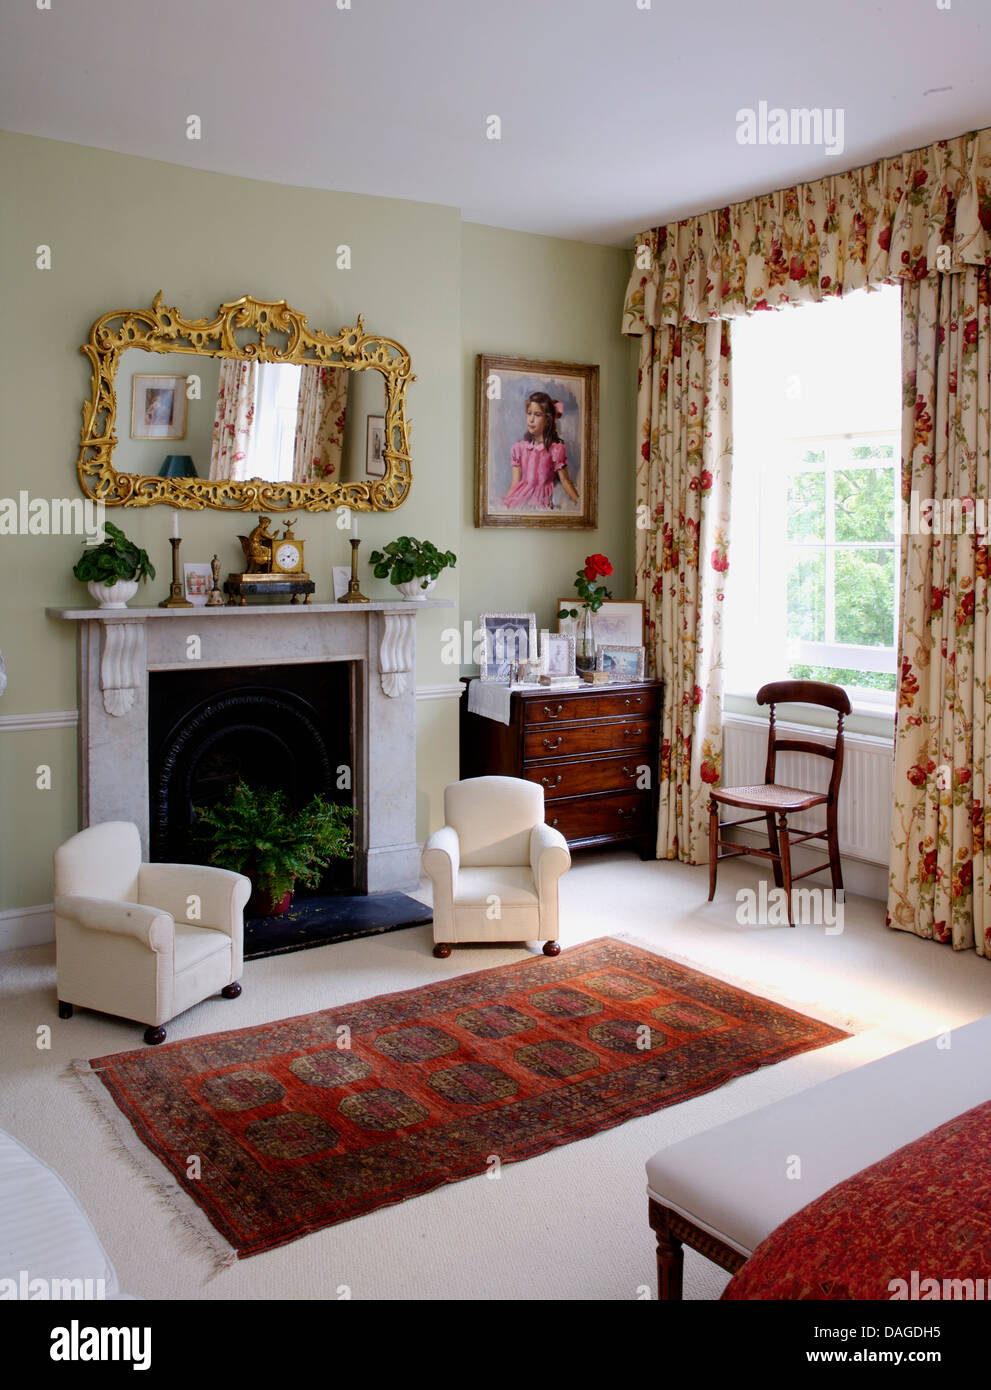 grne teppiche cheap teppiche with grne teppiche wollteppich cheviot ssw teppiche grne erde. Black Bedroom Furniture Sets. Home Design Ideas